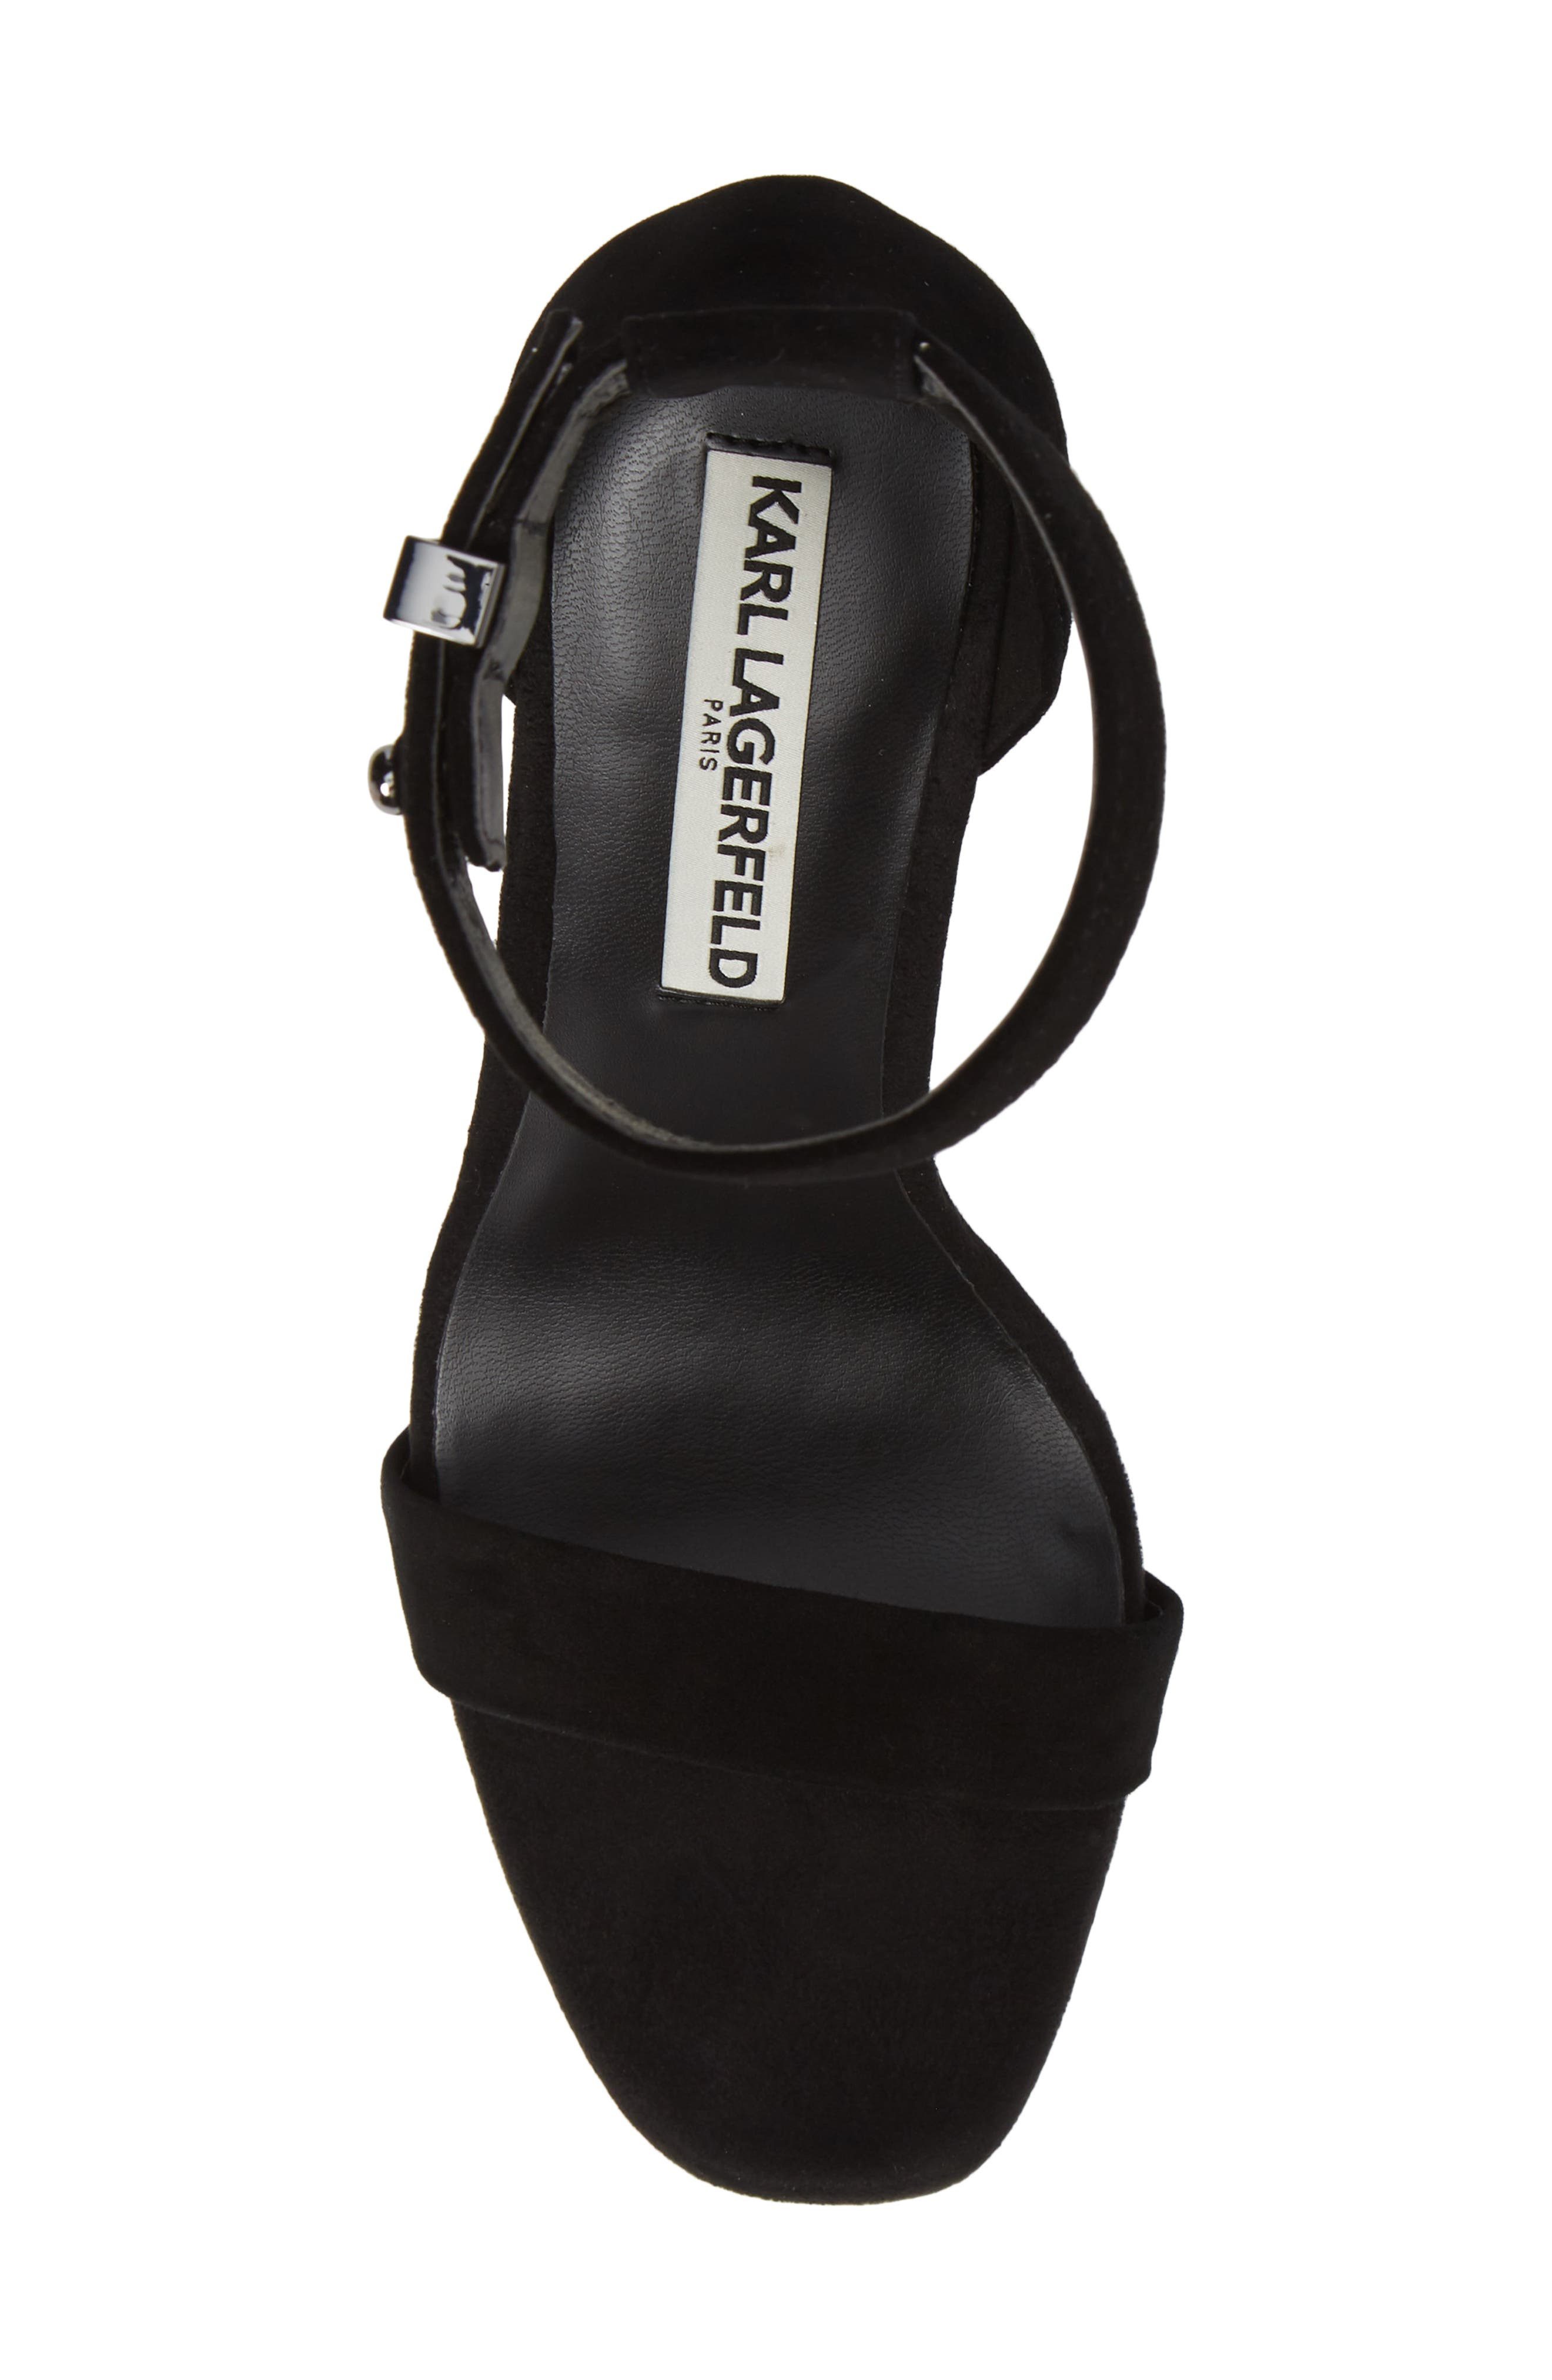 KARL LAGERFELD PARIS, Carah Ankle Strap Sandal, Alternate thumbnail 5, color, BLACK SUEDE